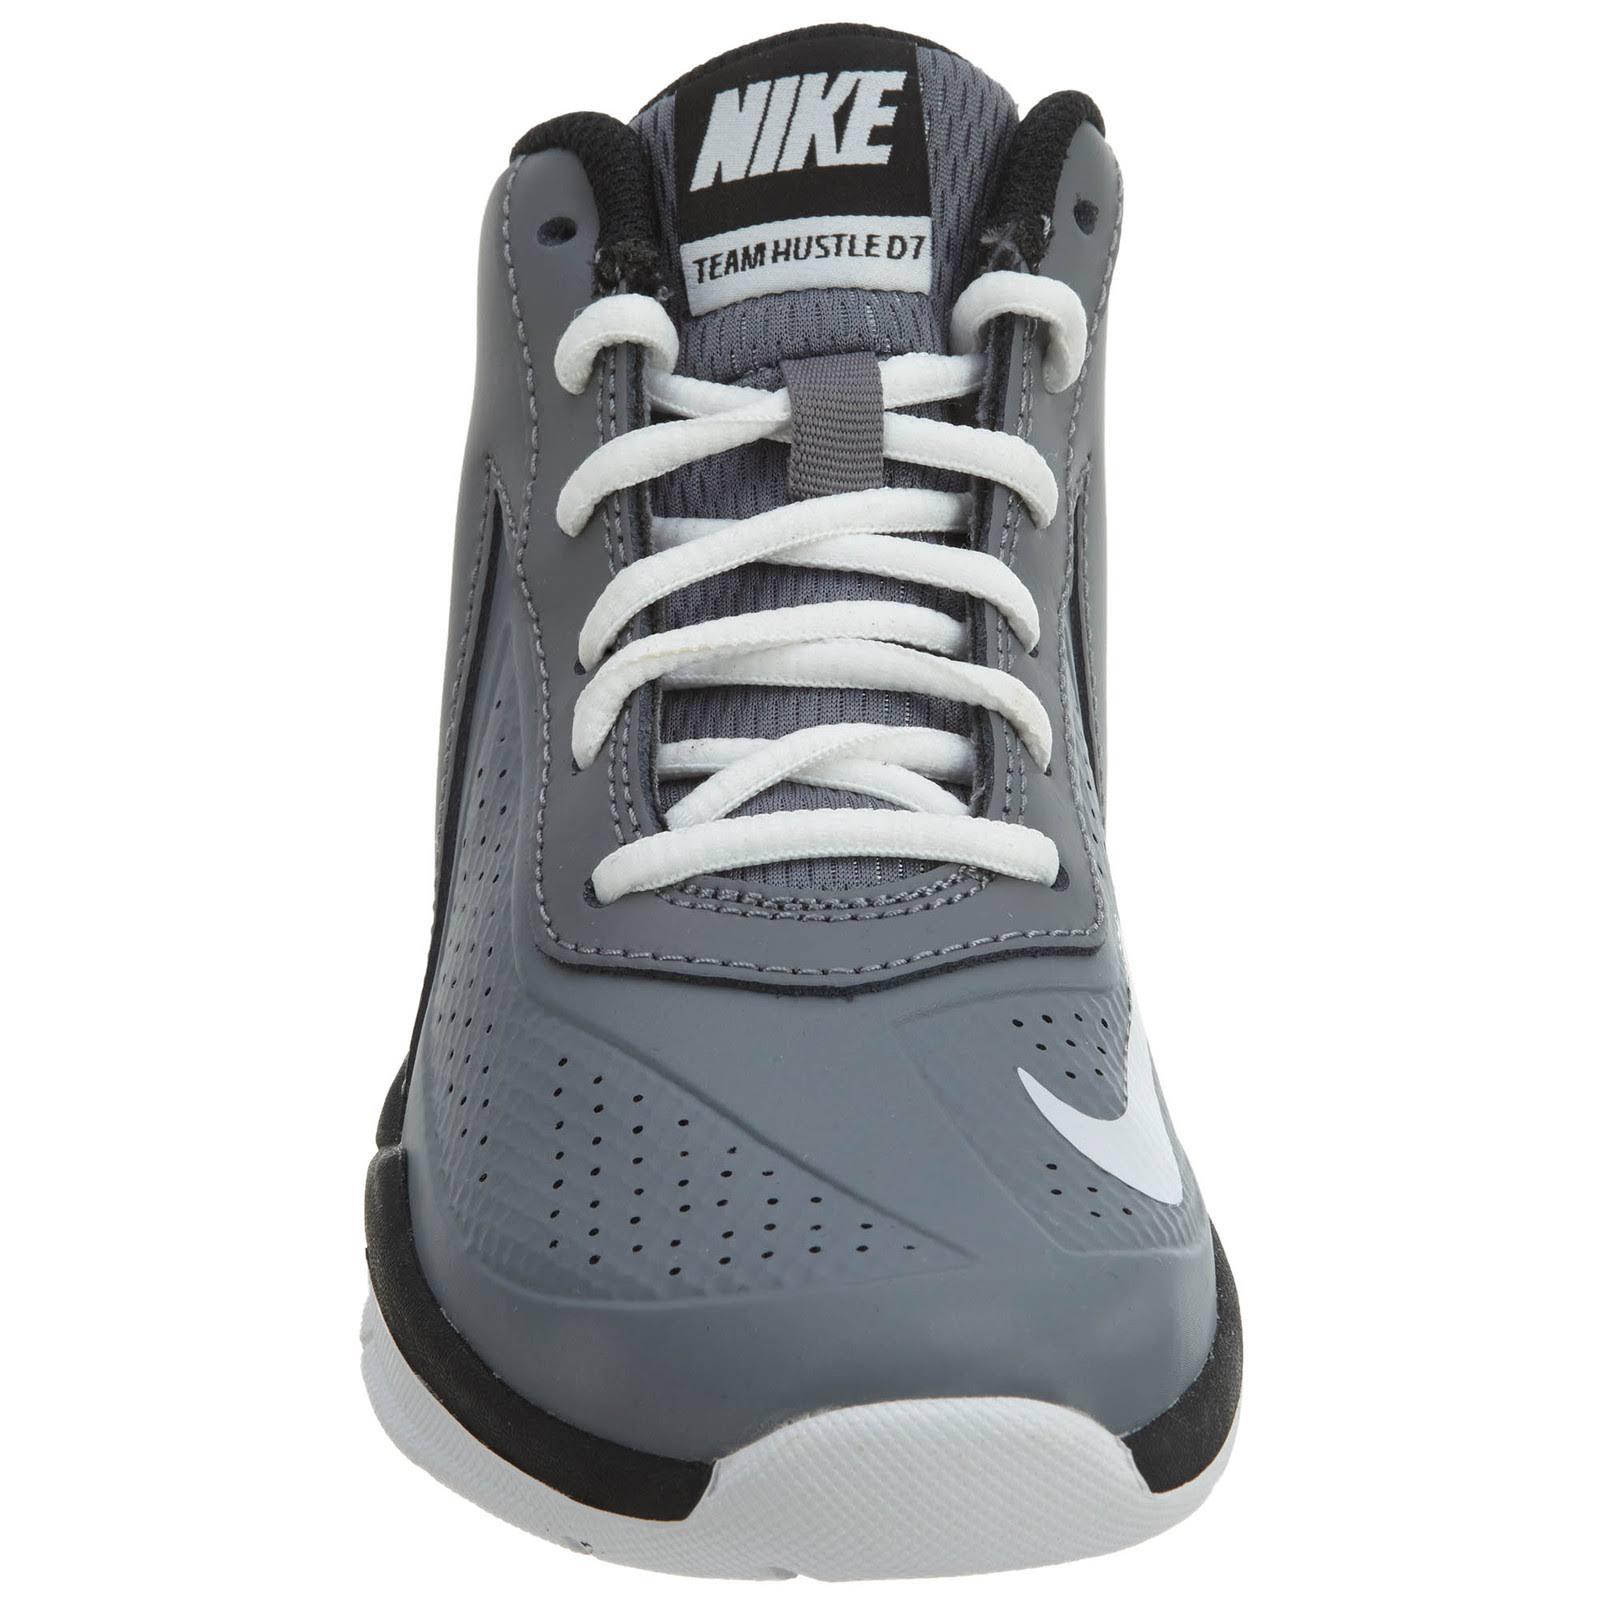 Hustle Weiß schwarz Jungen Nike Jugend D7 Mädchen Basketballschuhe Cool Team 747999 Grey Kinder Kleinkind wqFF1A6